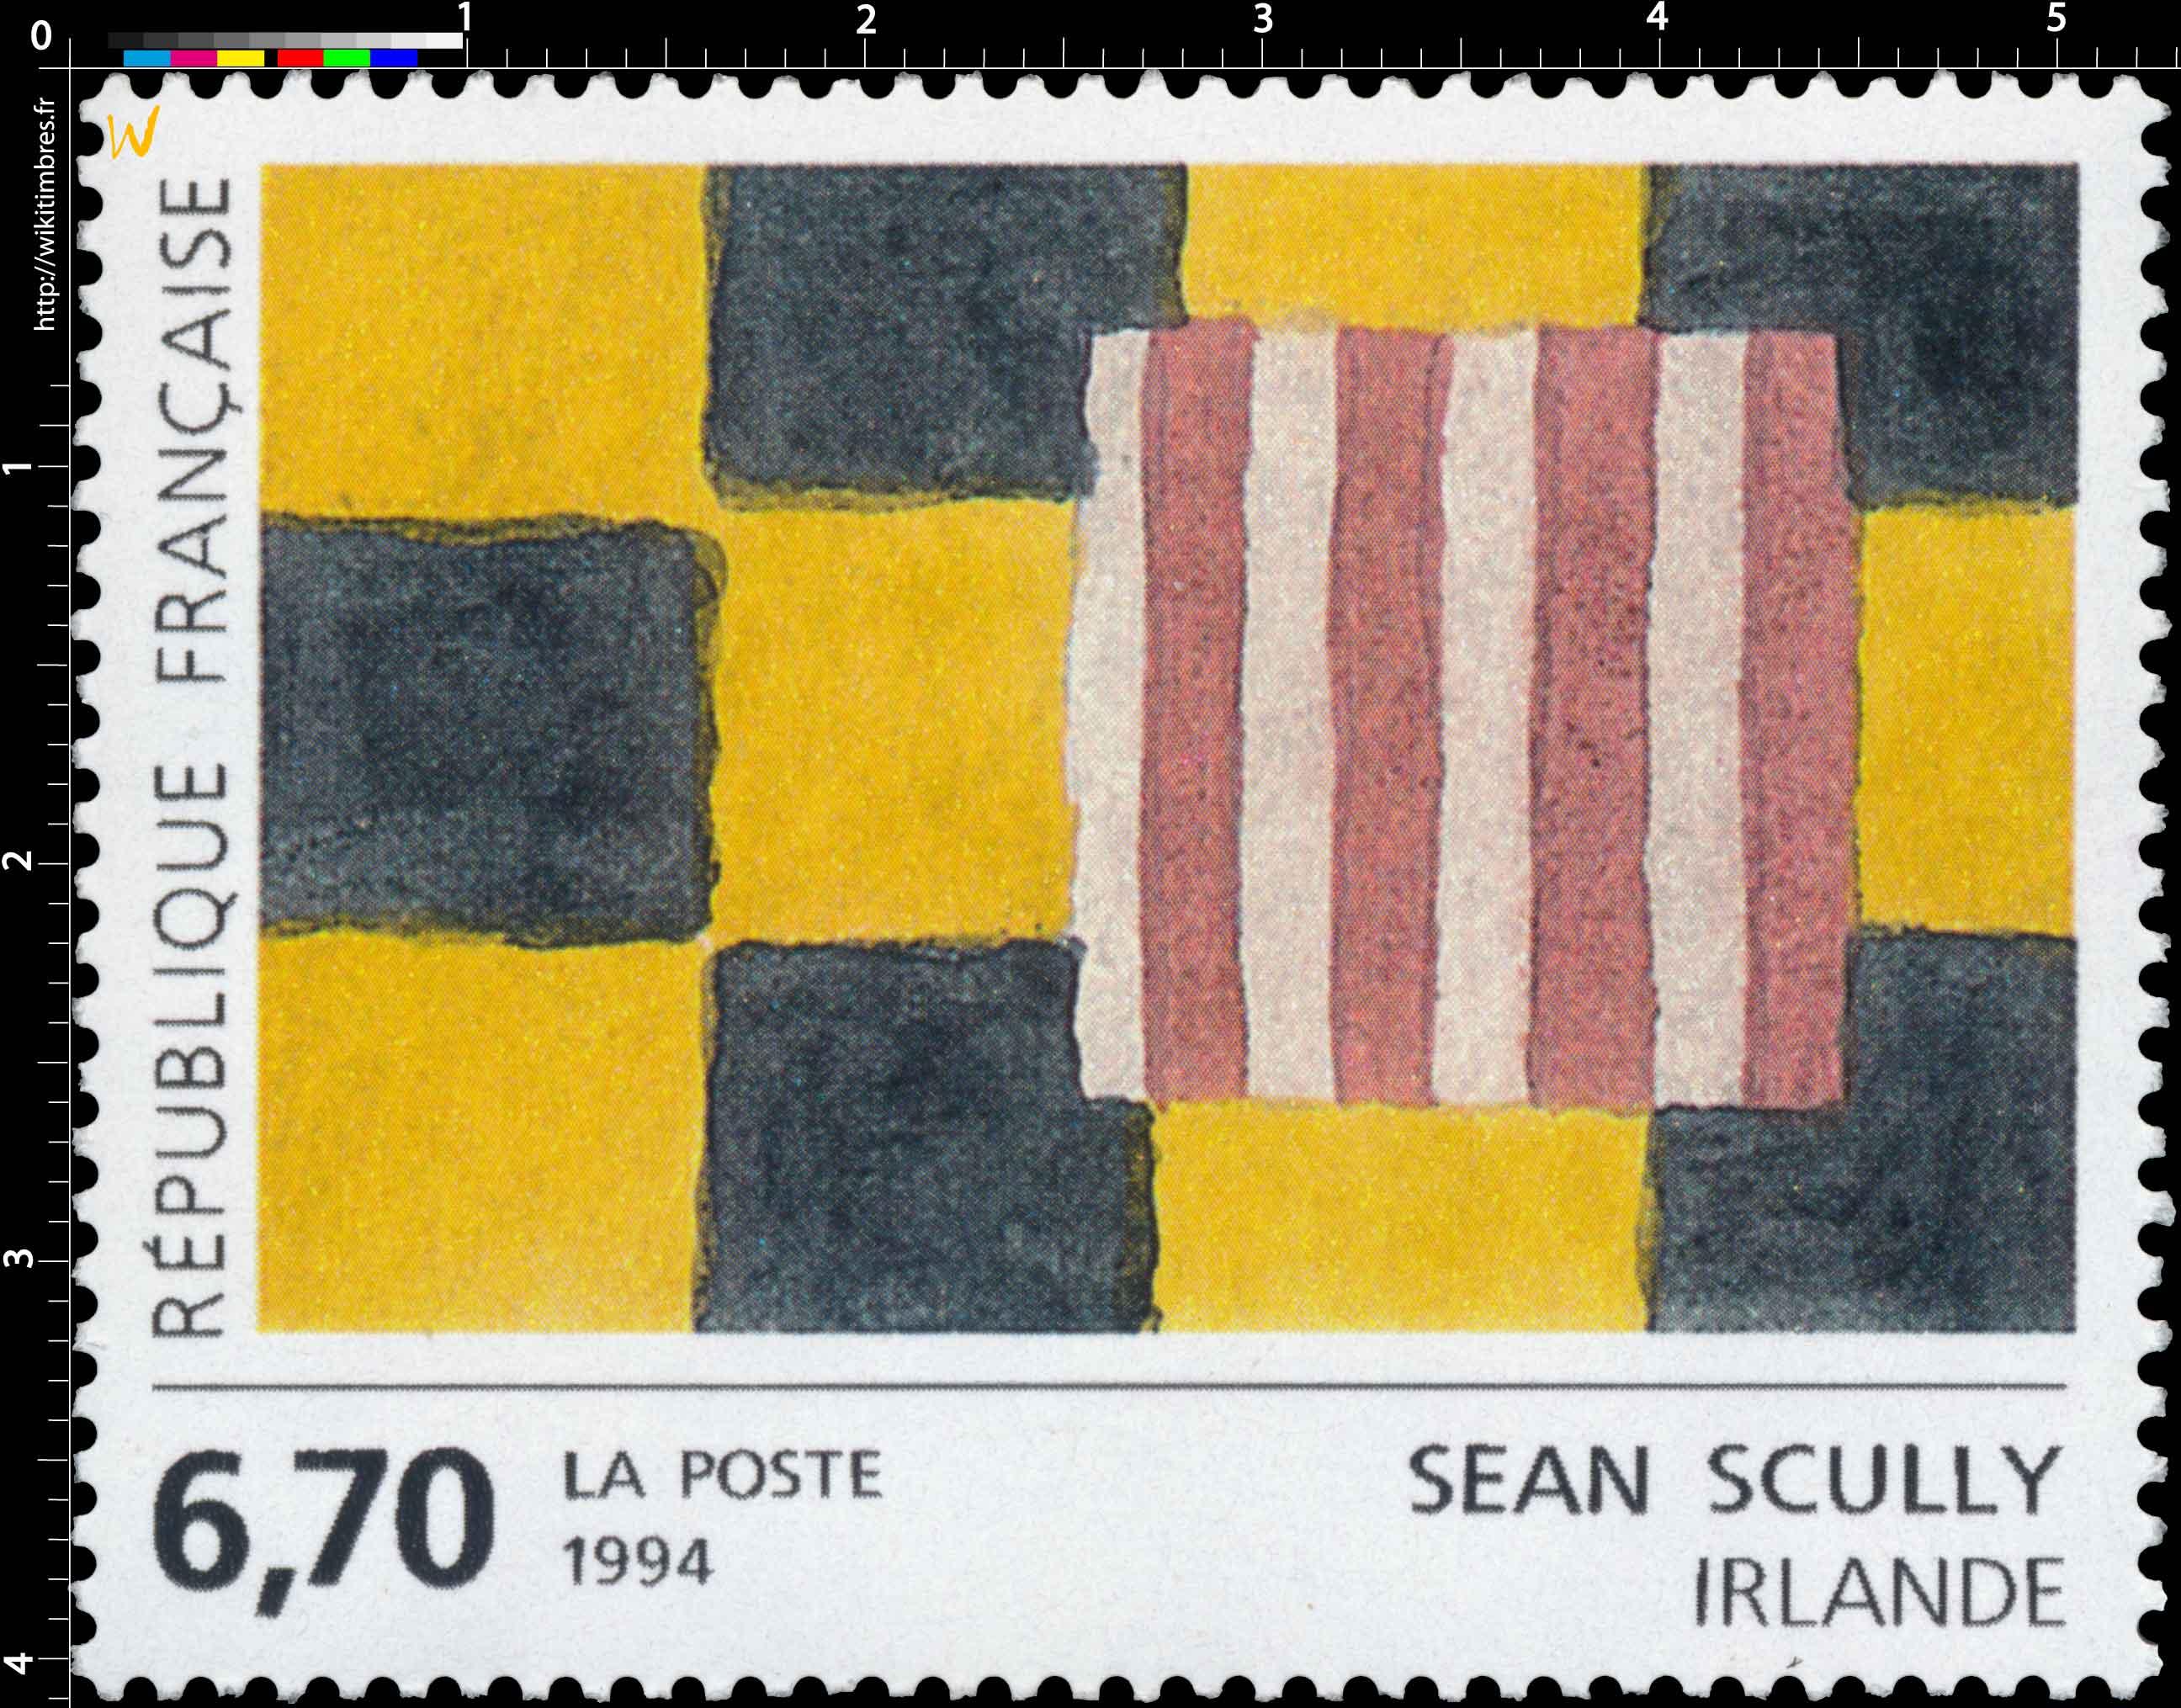 1994 SEAN SCULLY Irlande